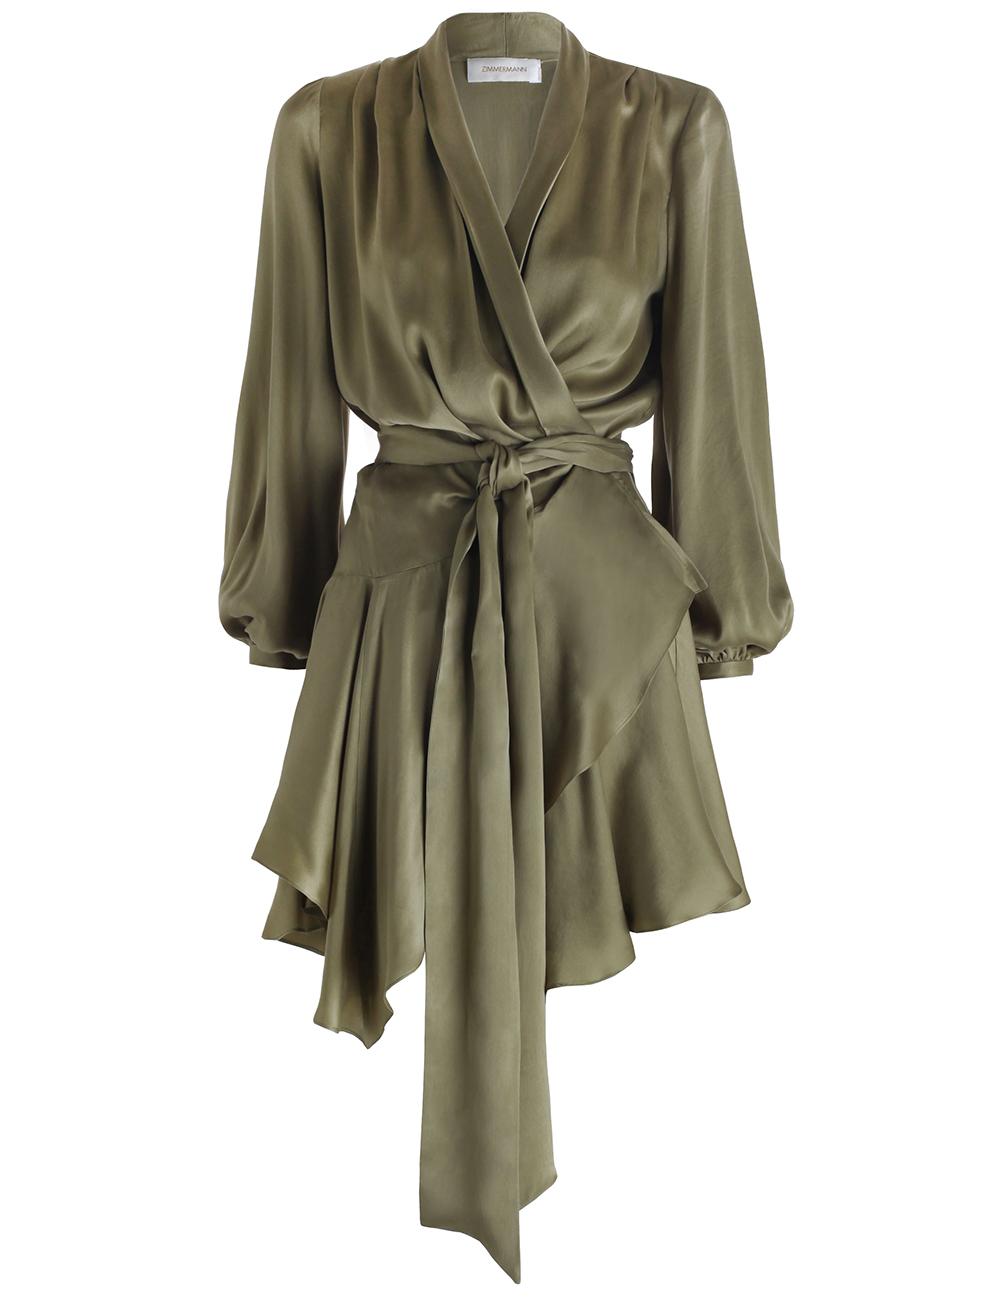 lyst zimmermann empire sueded robe dress in green. Black Bedroom Furniture Sets. Home Design Ideas